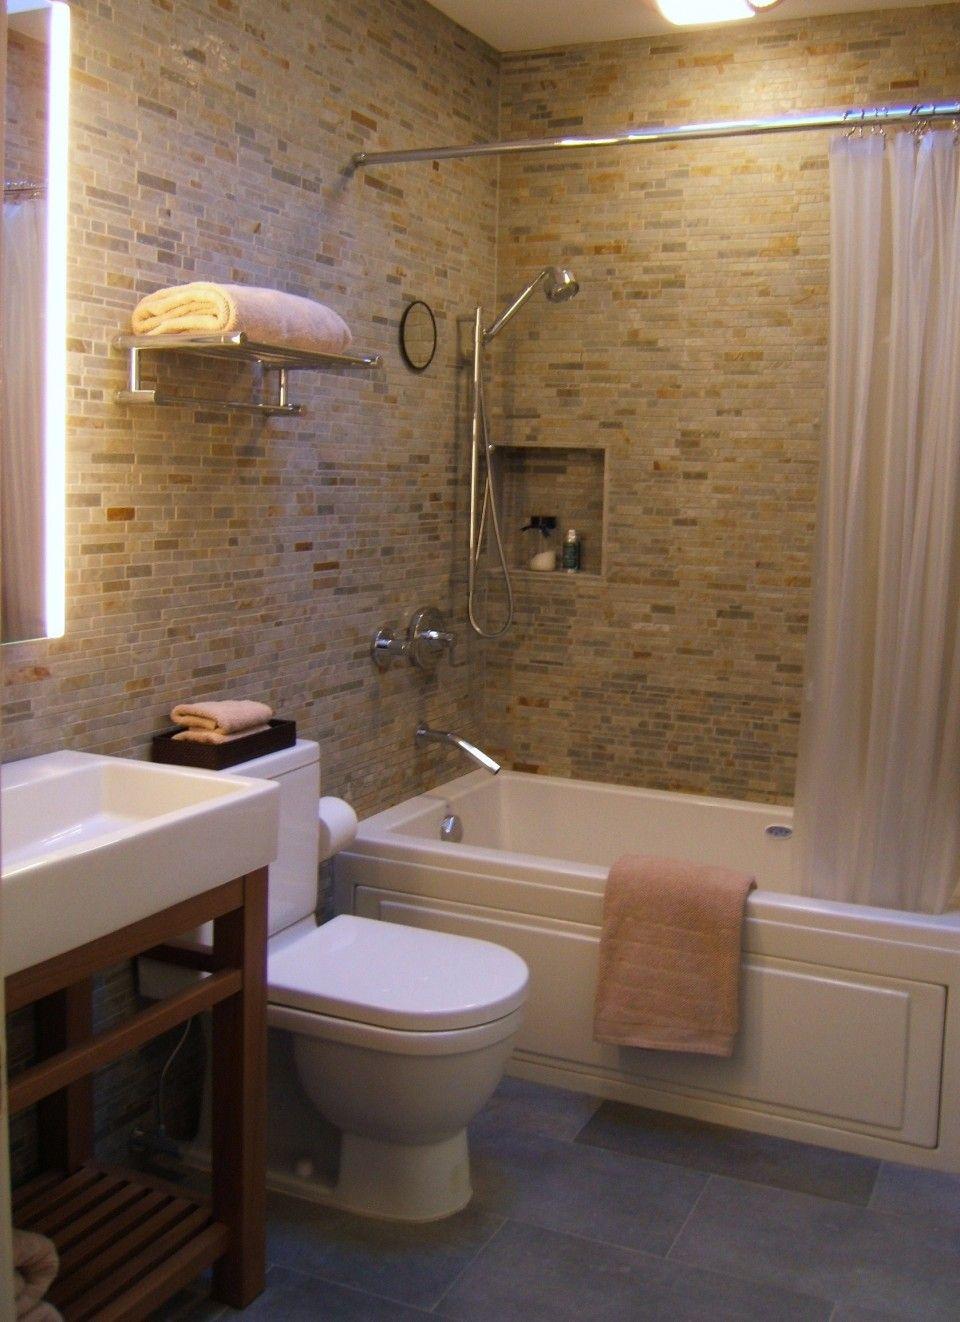 Bathroom Designs Hd Images